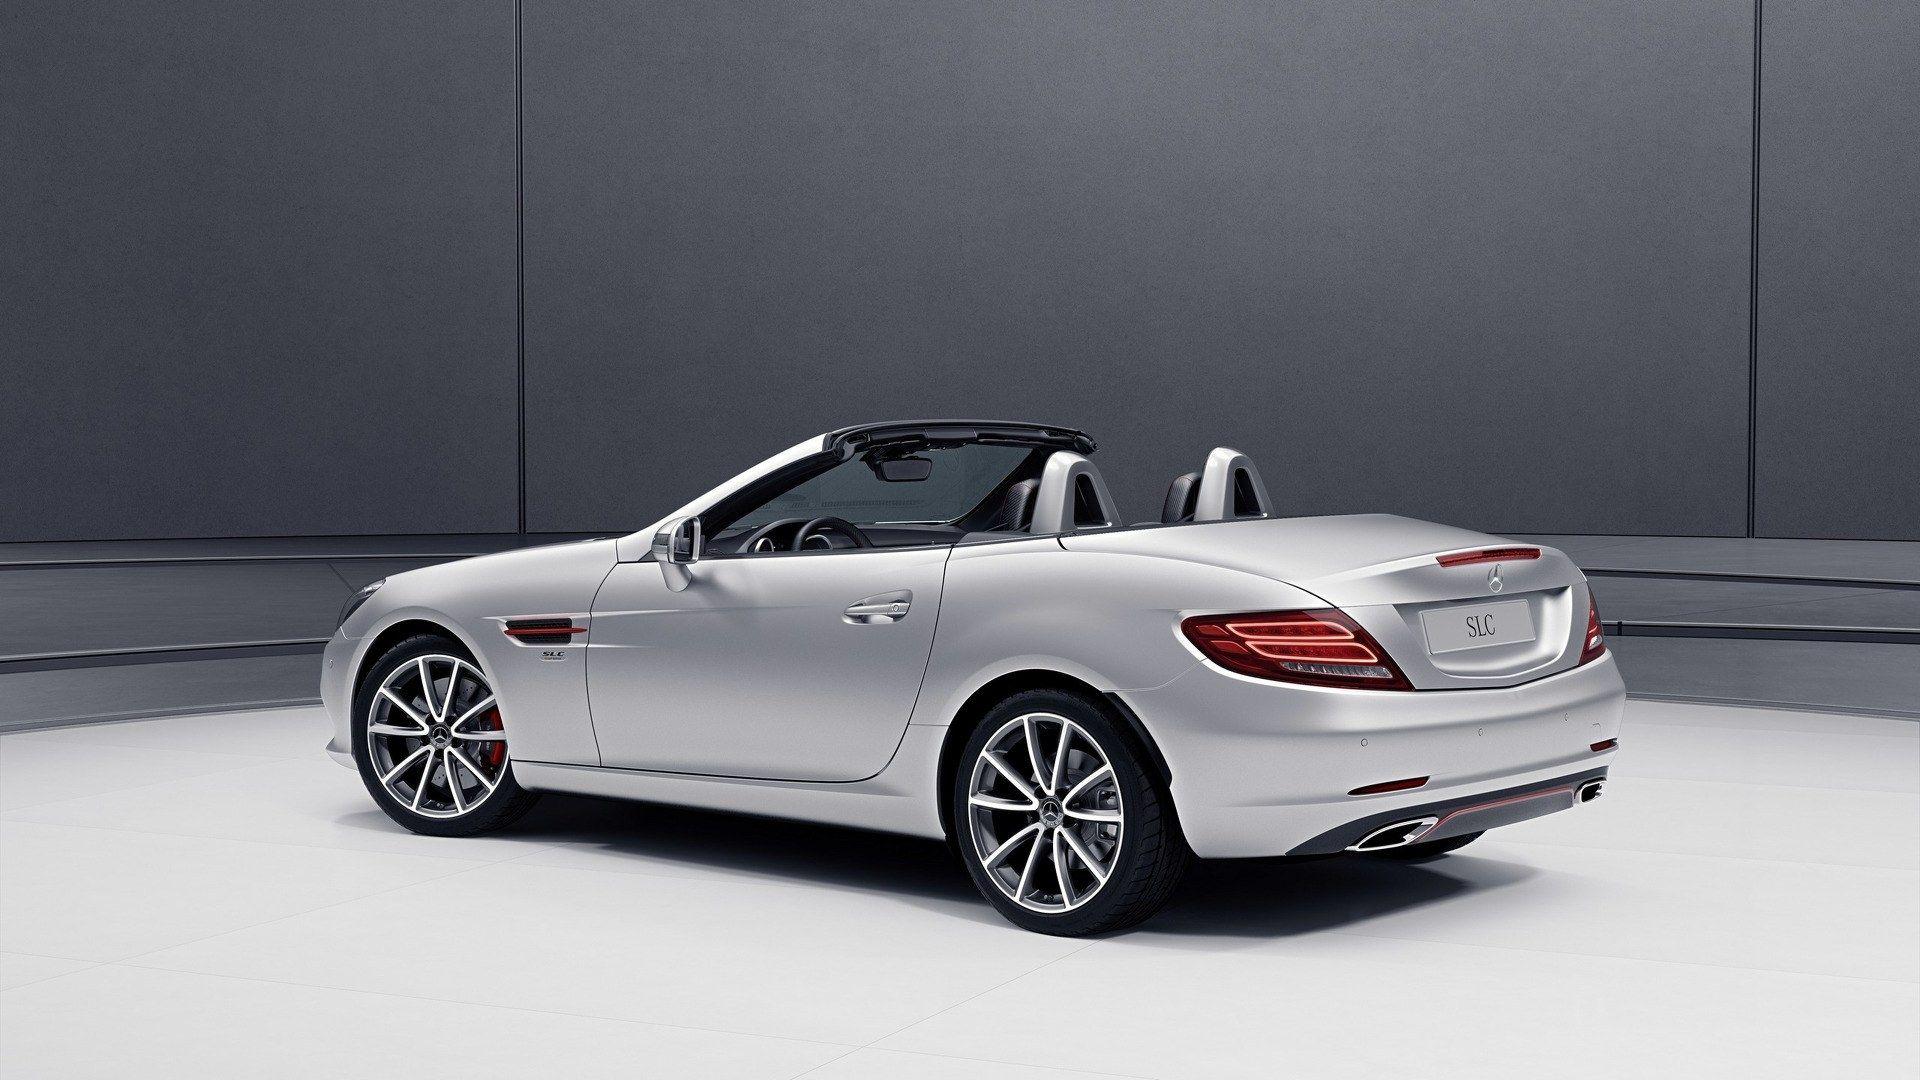 New 2020 Mercedes Slc Class Redart Edition Price And Release Date Mercedes Slc Mercedes Benz Mercedes Benz Slk